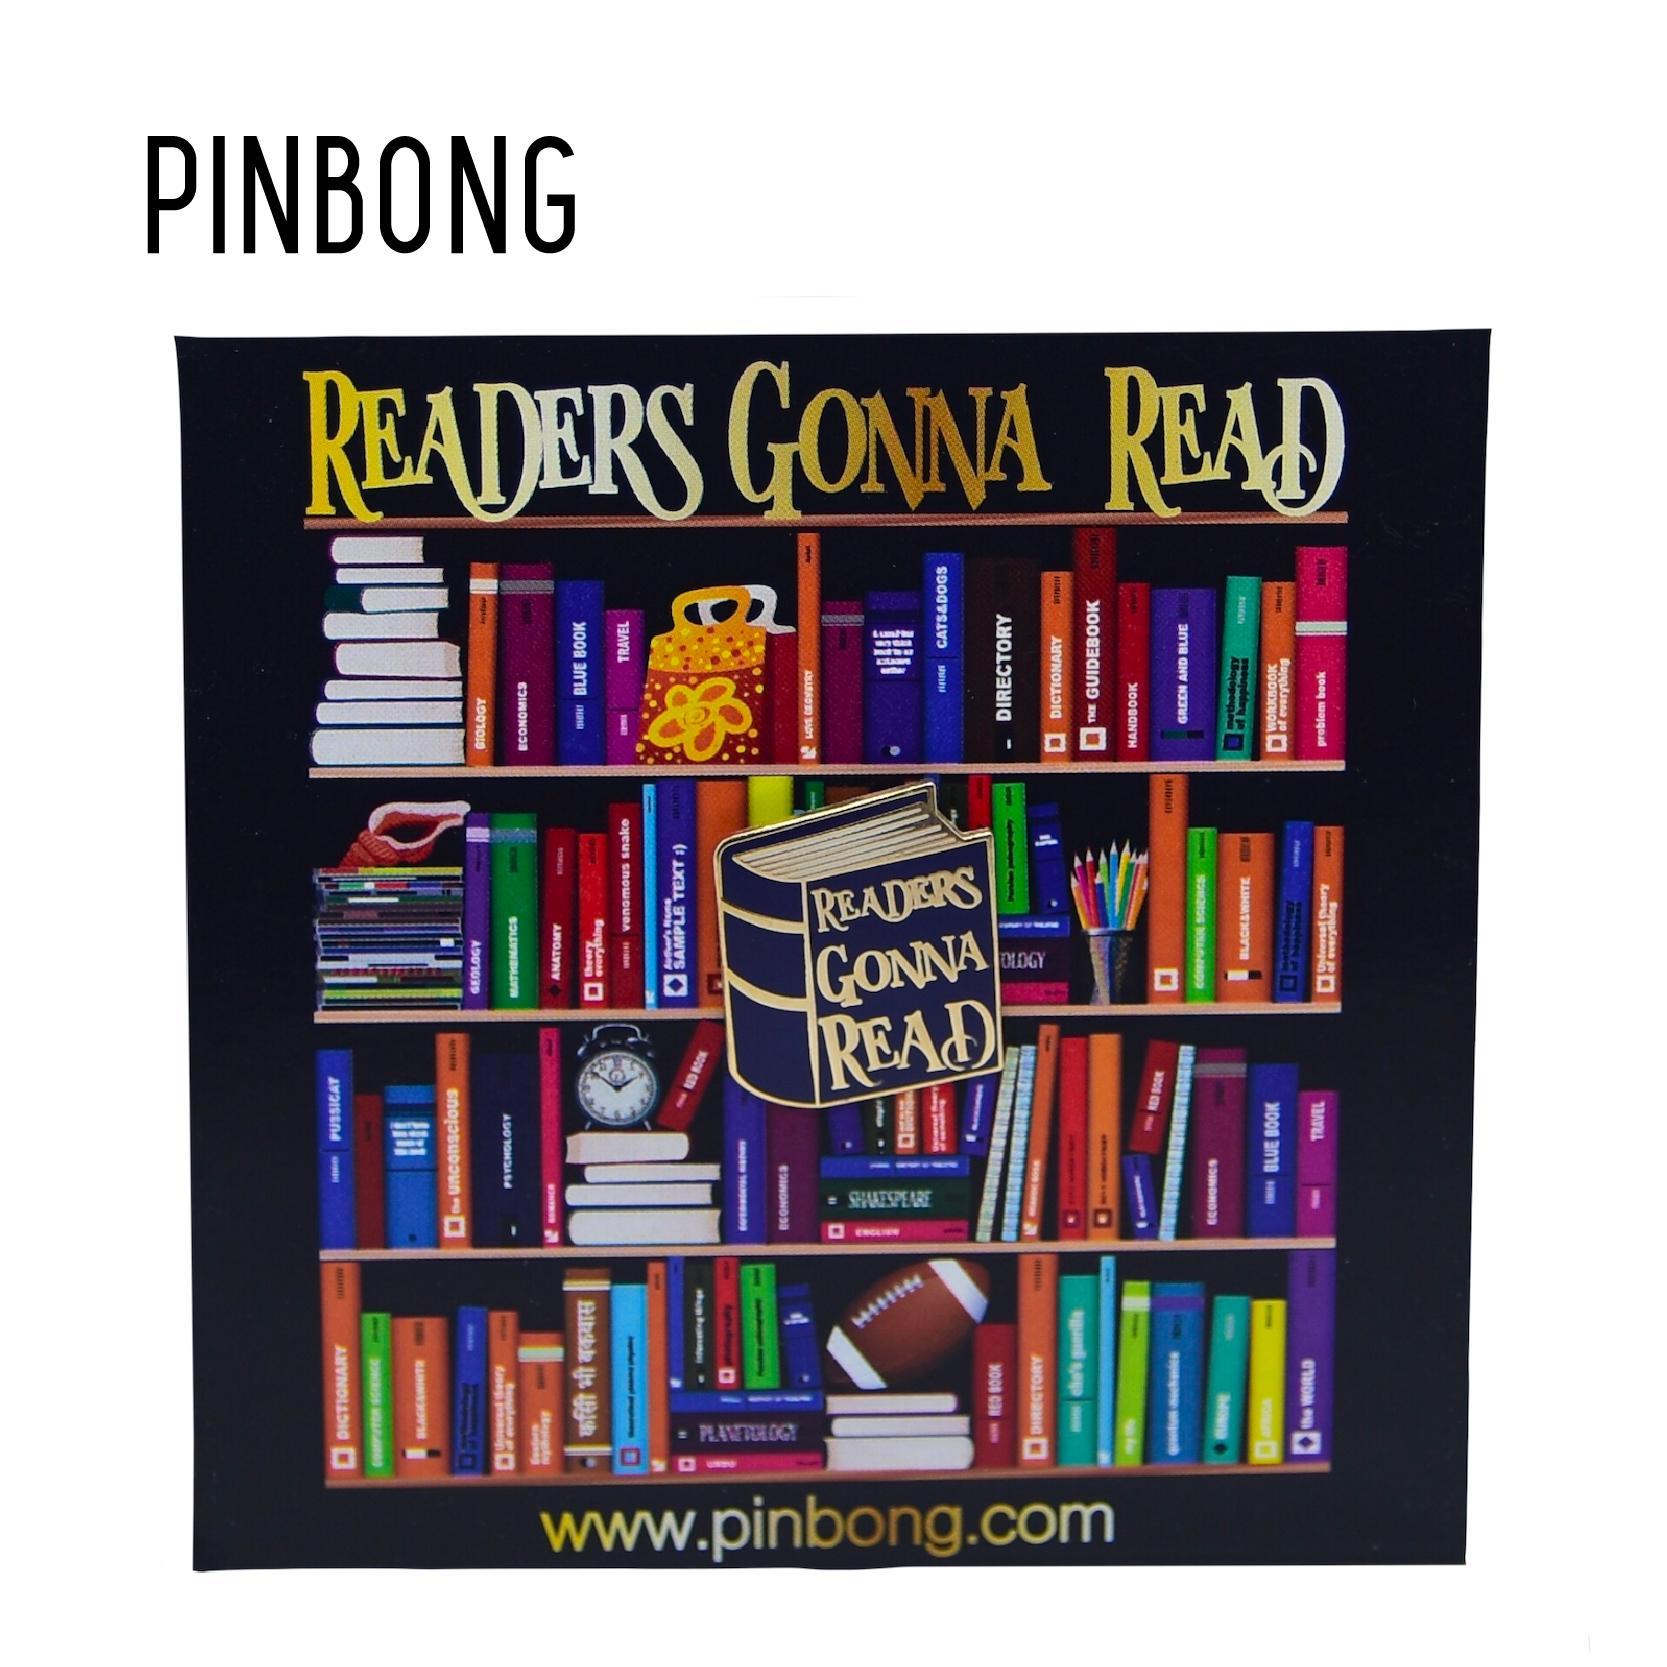 Huy Hiệu Readers Gonna Read